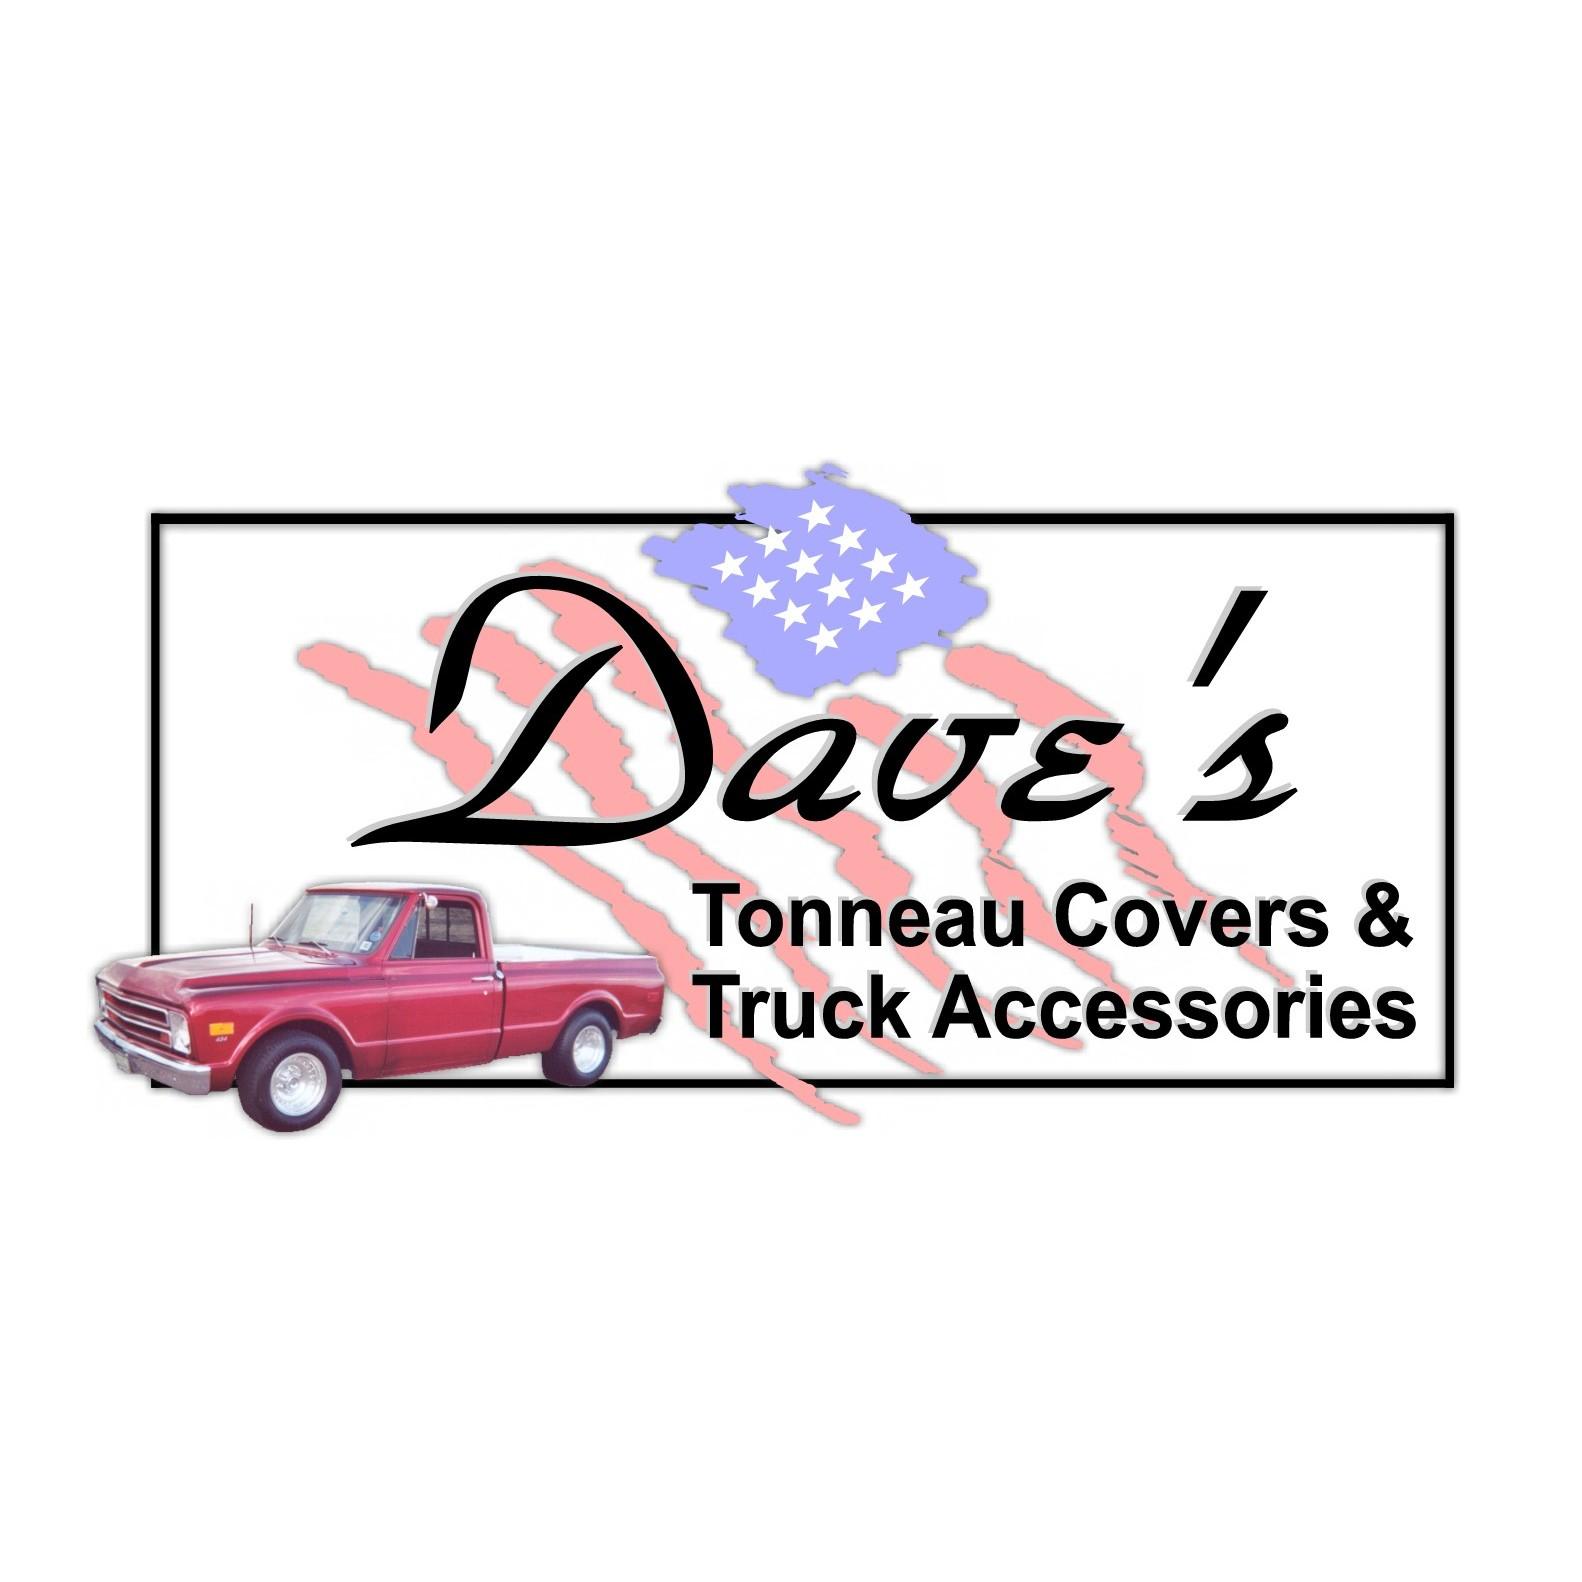 Dave's Tonneau Covers & Truck Accessories - Aurora, CO 80011 - (303)326-0500 | ShowMeLocal.com